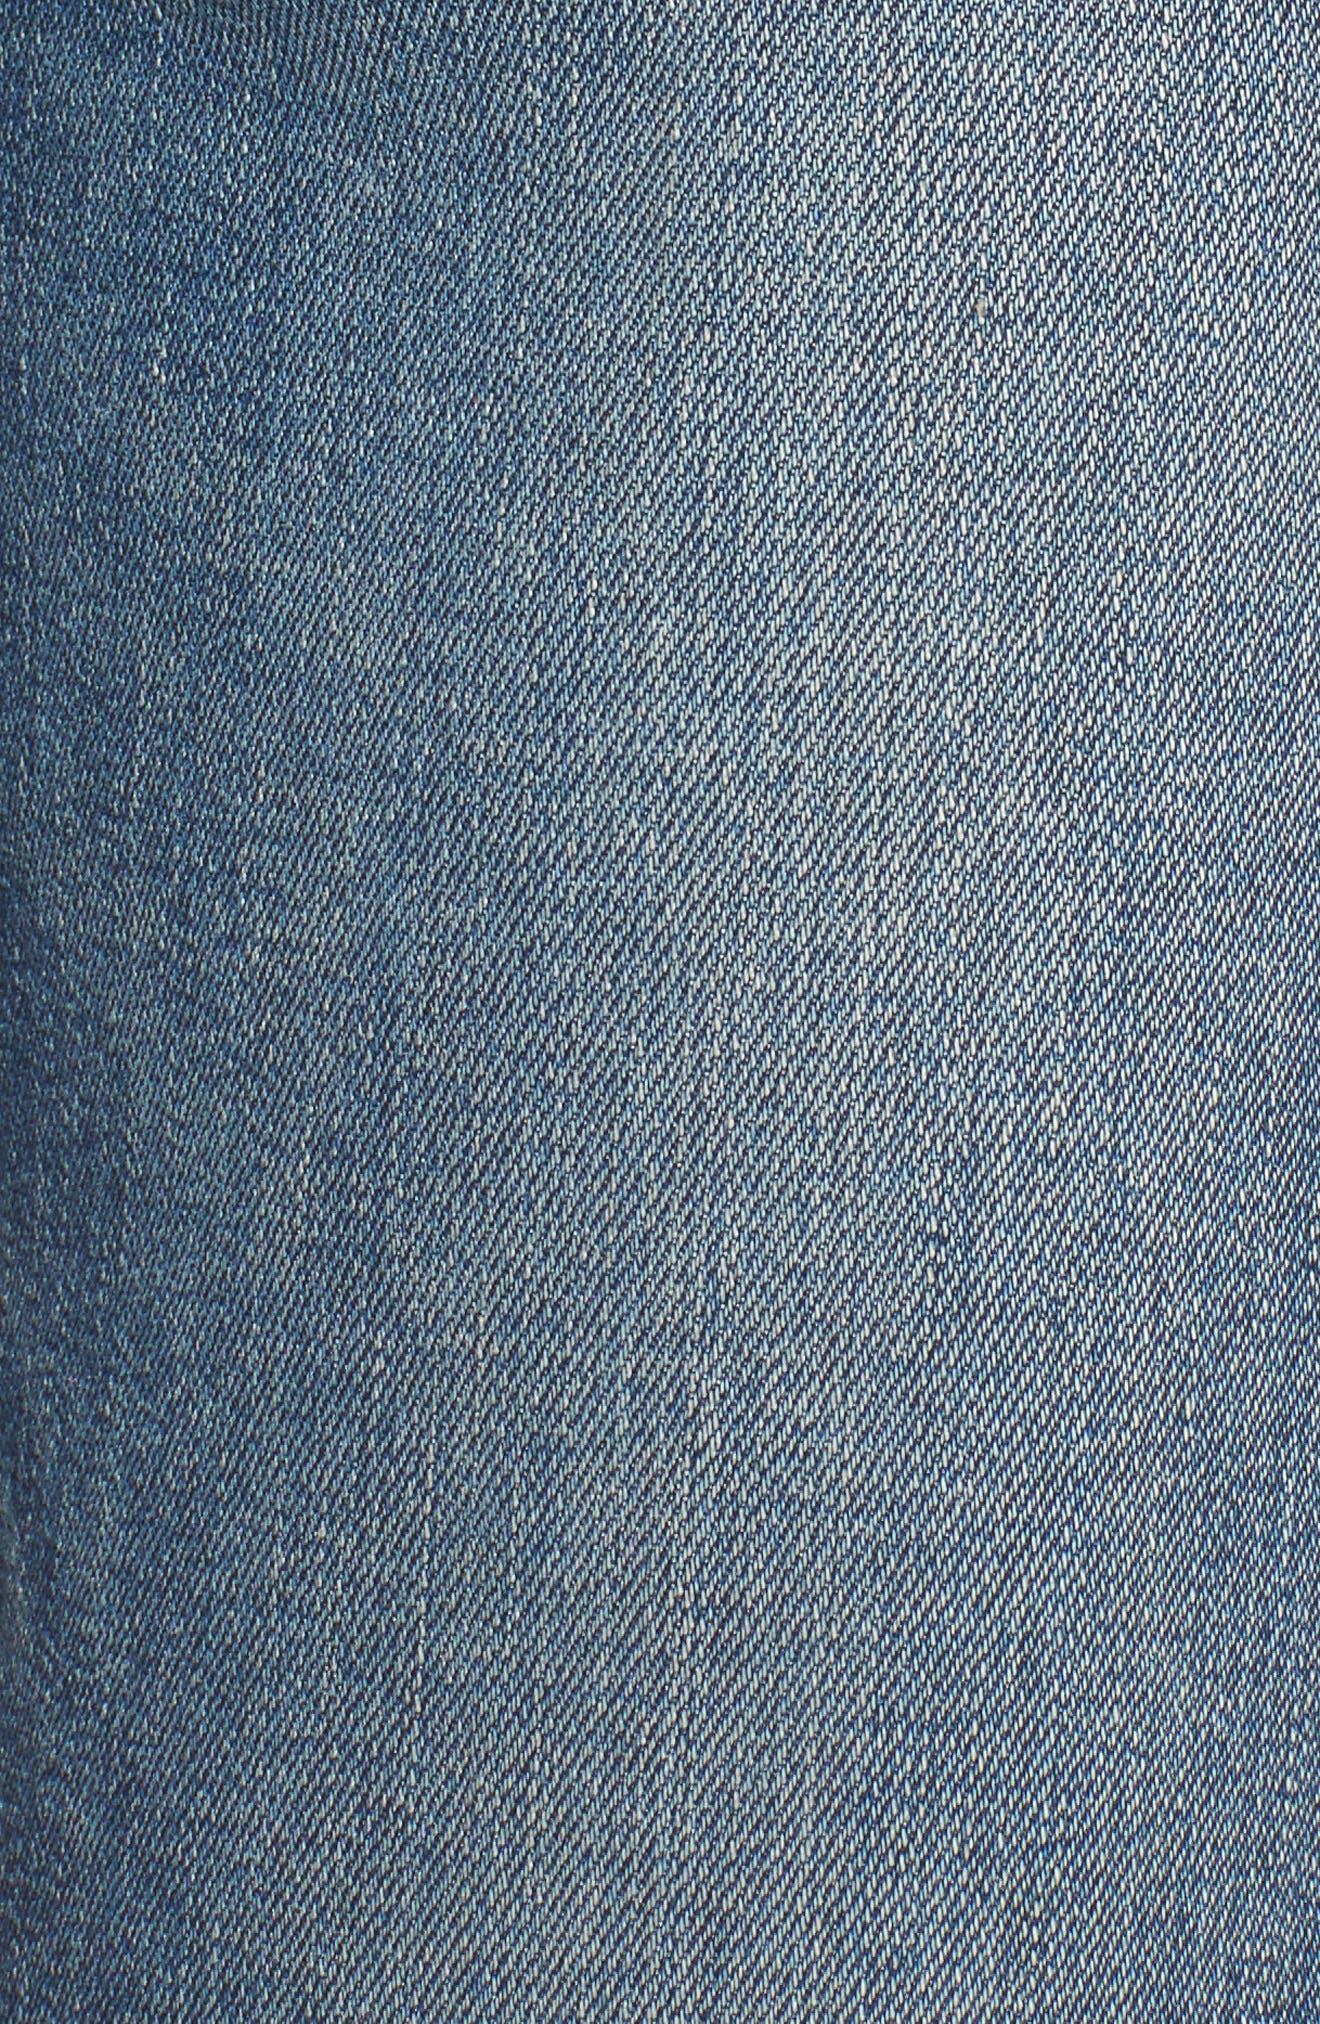 Zoeey High Waist Crop Jeans,                             Alternate thumbnail 5, color,                             460